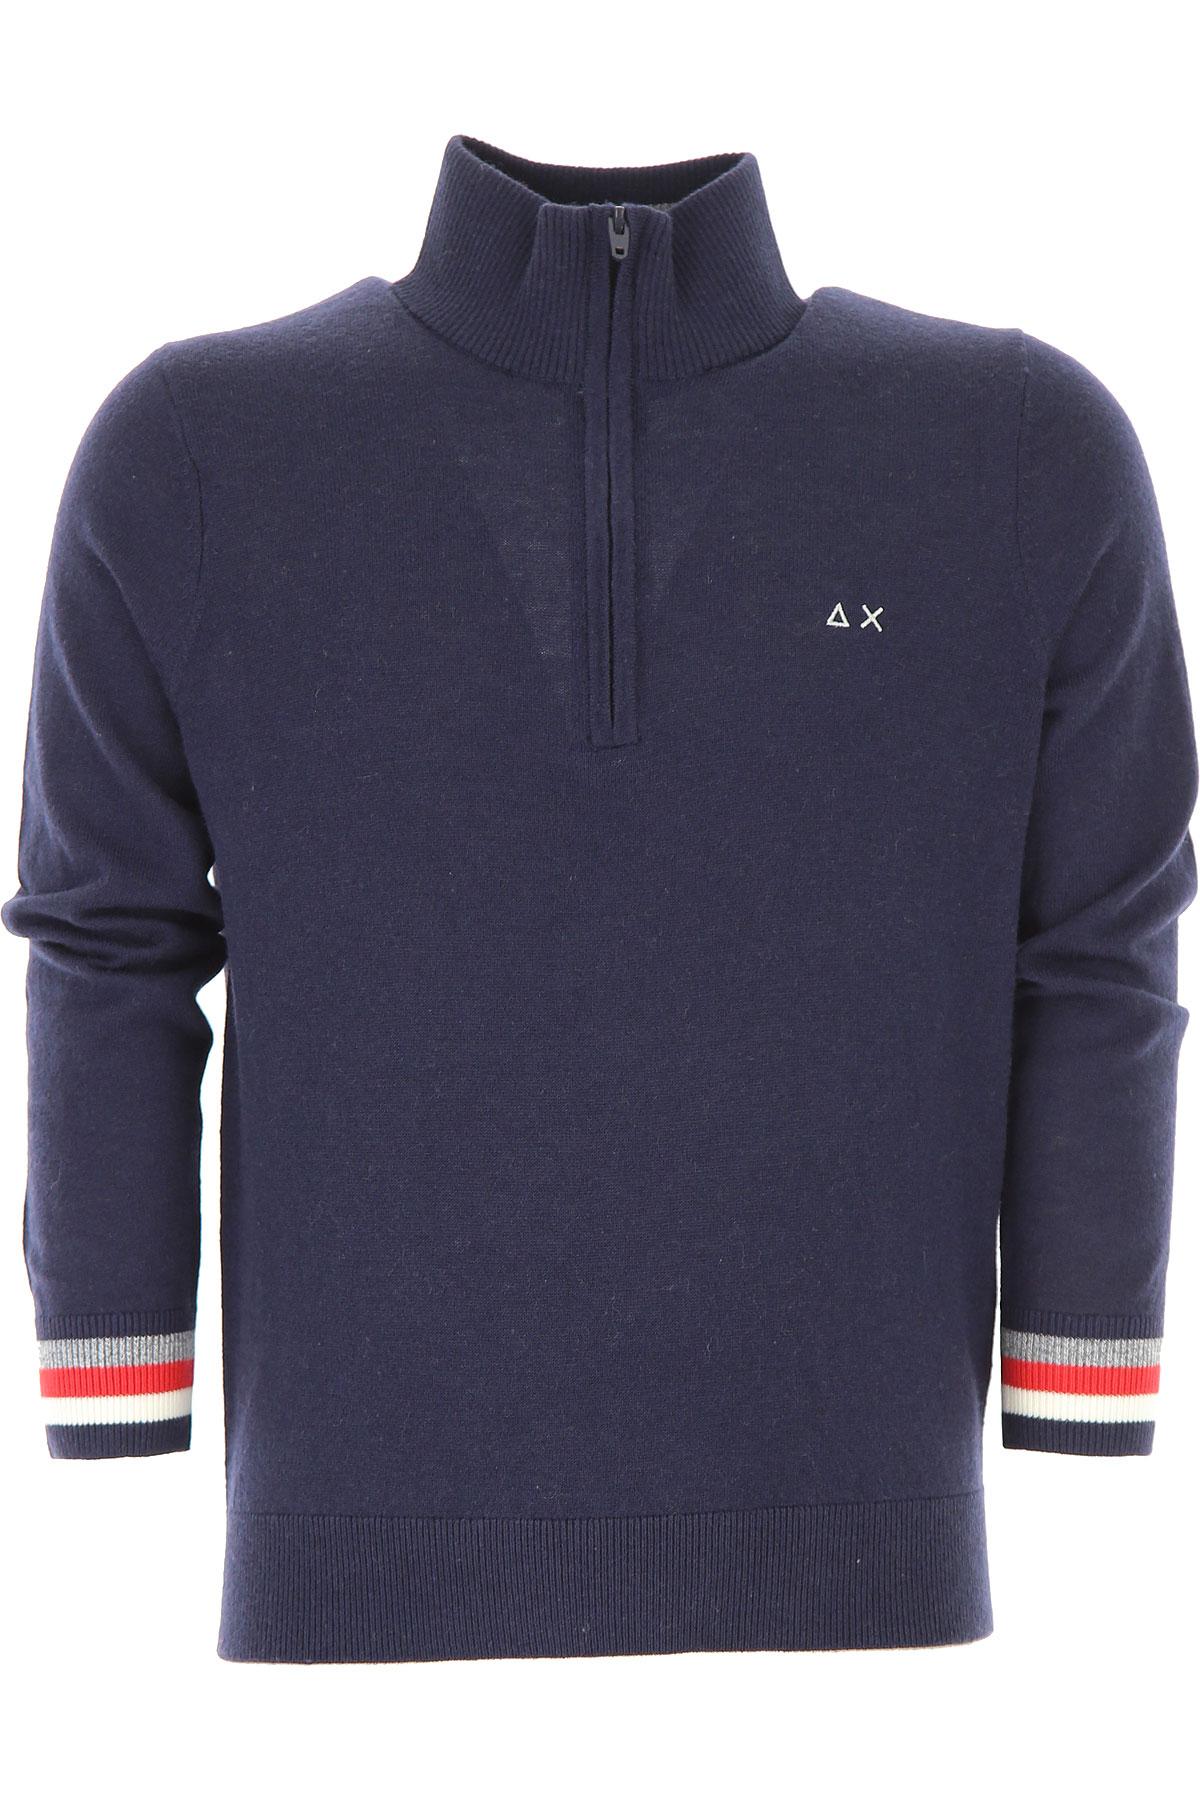 Image of Sun68 Kids Sweaters for Boys, Blue Navy, merino wool, 2017, 10Y 14Y 2Y 4Y 6Y 8Y